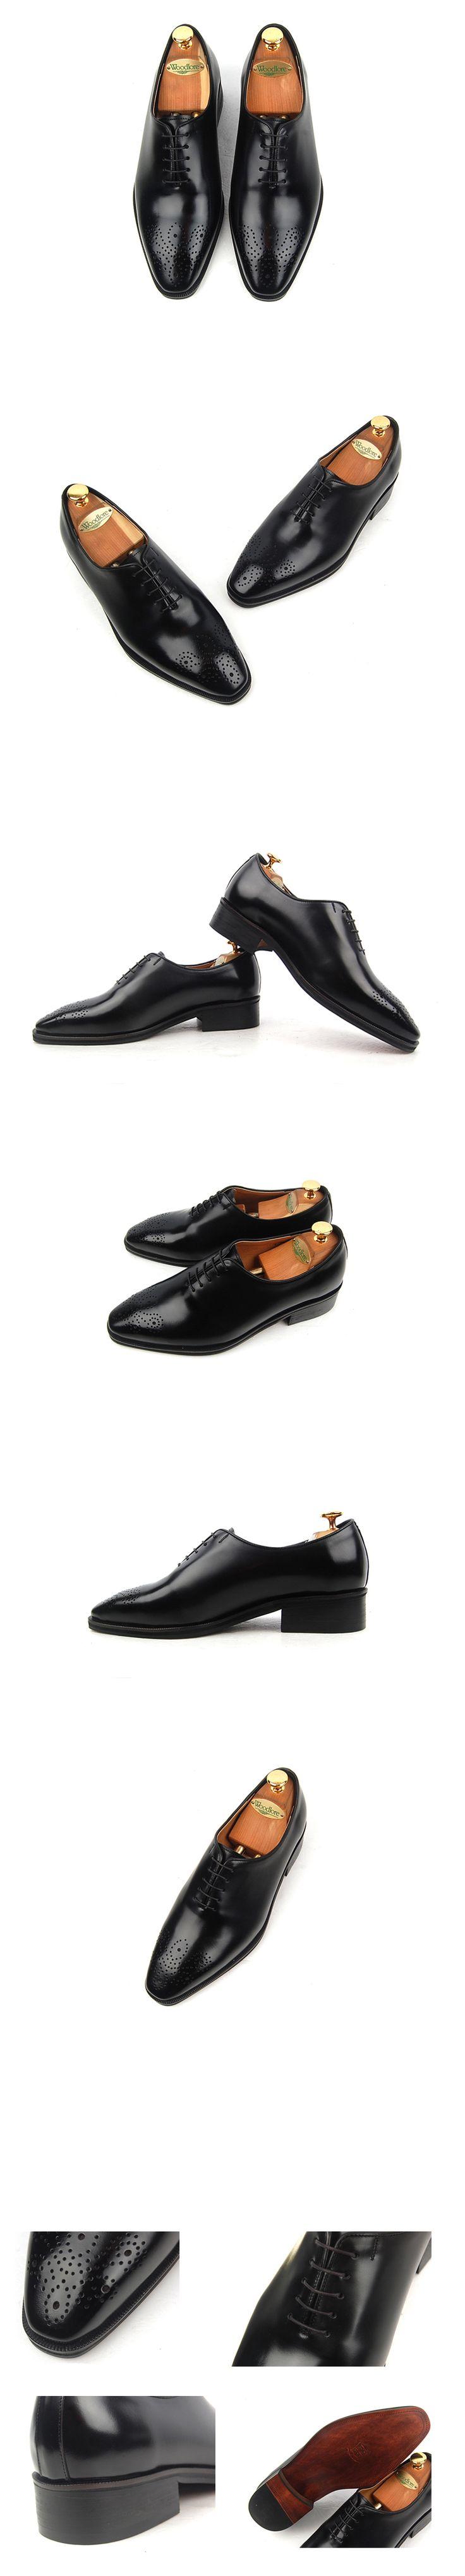 H3THECLASSIC loafer shoes man fashion #h3theclassicl#handmadeshoes#shoes#madeinkorea#instashoes#classic#menshoes#oxford#h3theclassic#fashion#custom#handmade#mensshoes#instashoe#손신발#에이치쓰리더클래식#수제화#남성수제화#남자수제화#커스텀#남자구두#핸드메이드#신스타그램#맞춤#클리퍼#남성클리퍼#남자로퍼#맞춤클리퍼#fashionaddict#dailystyle#instafashion#ootd#ootdmagazine#lookbook#streetchic#데일리룩#OX-1005K www.h3theclassic.com